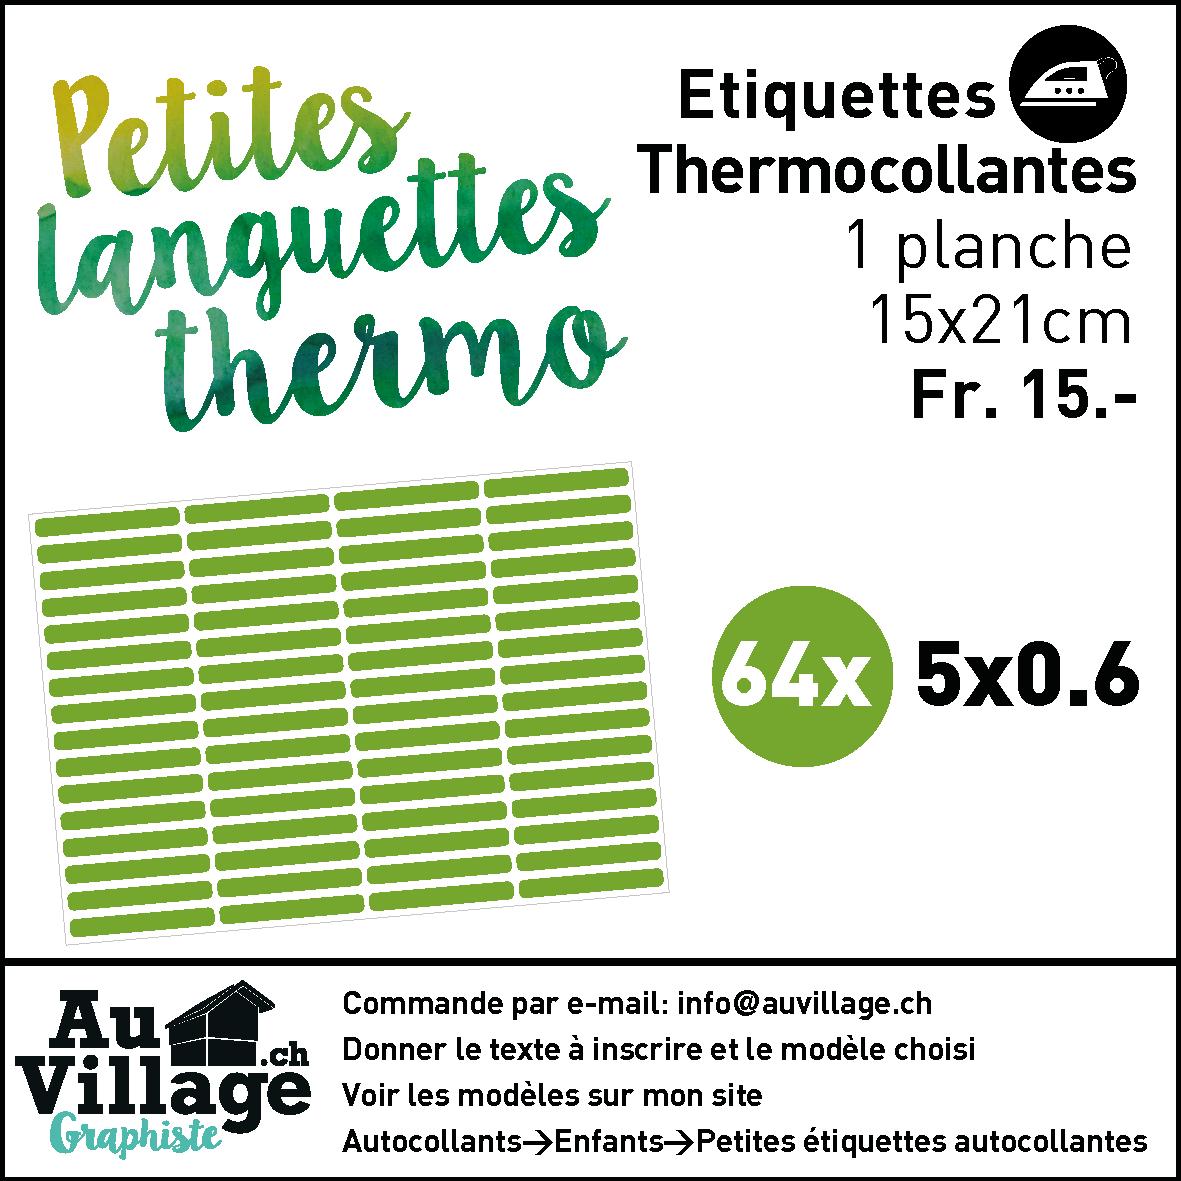 Etiquettes_vinyle&thermo-10